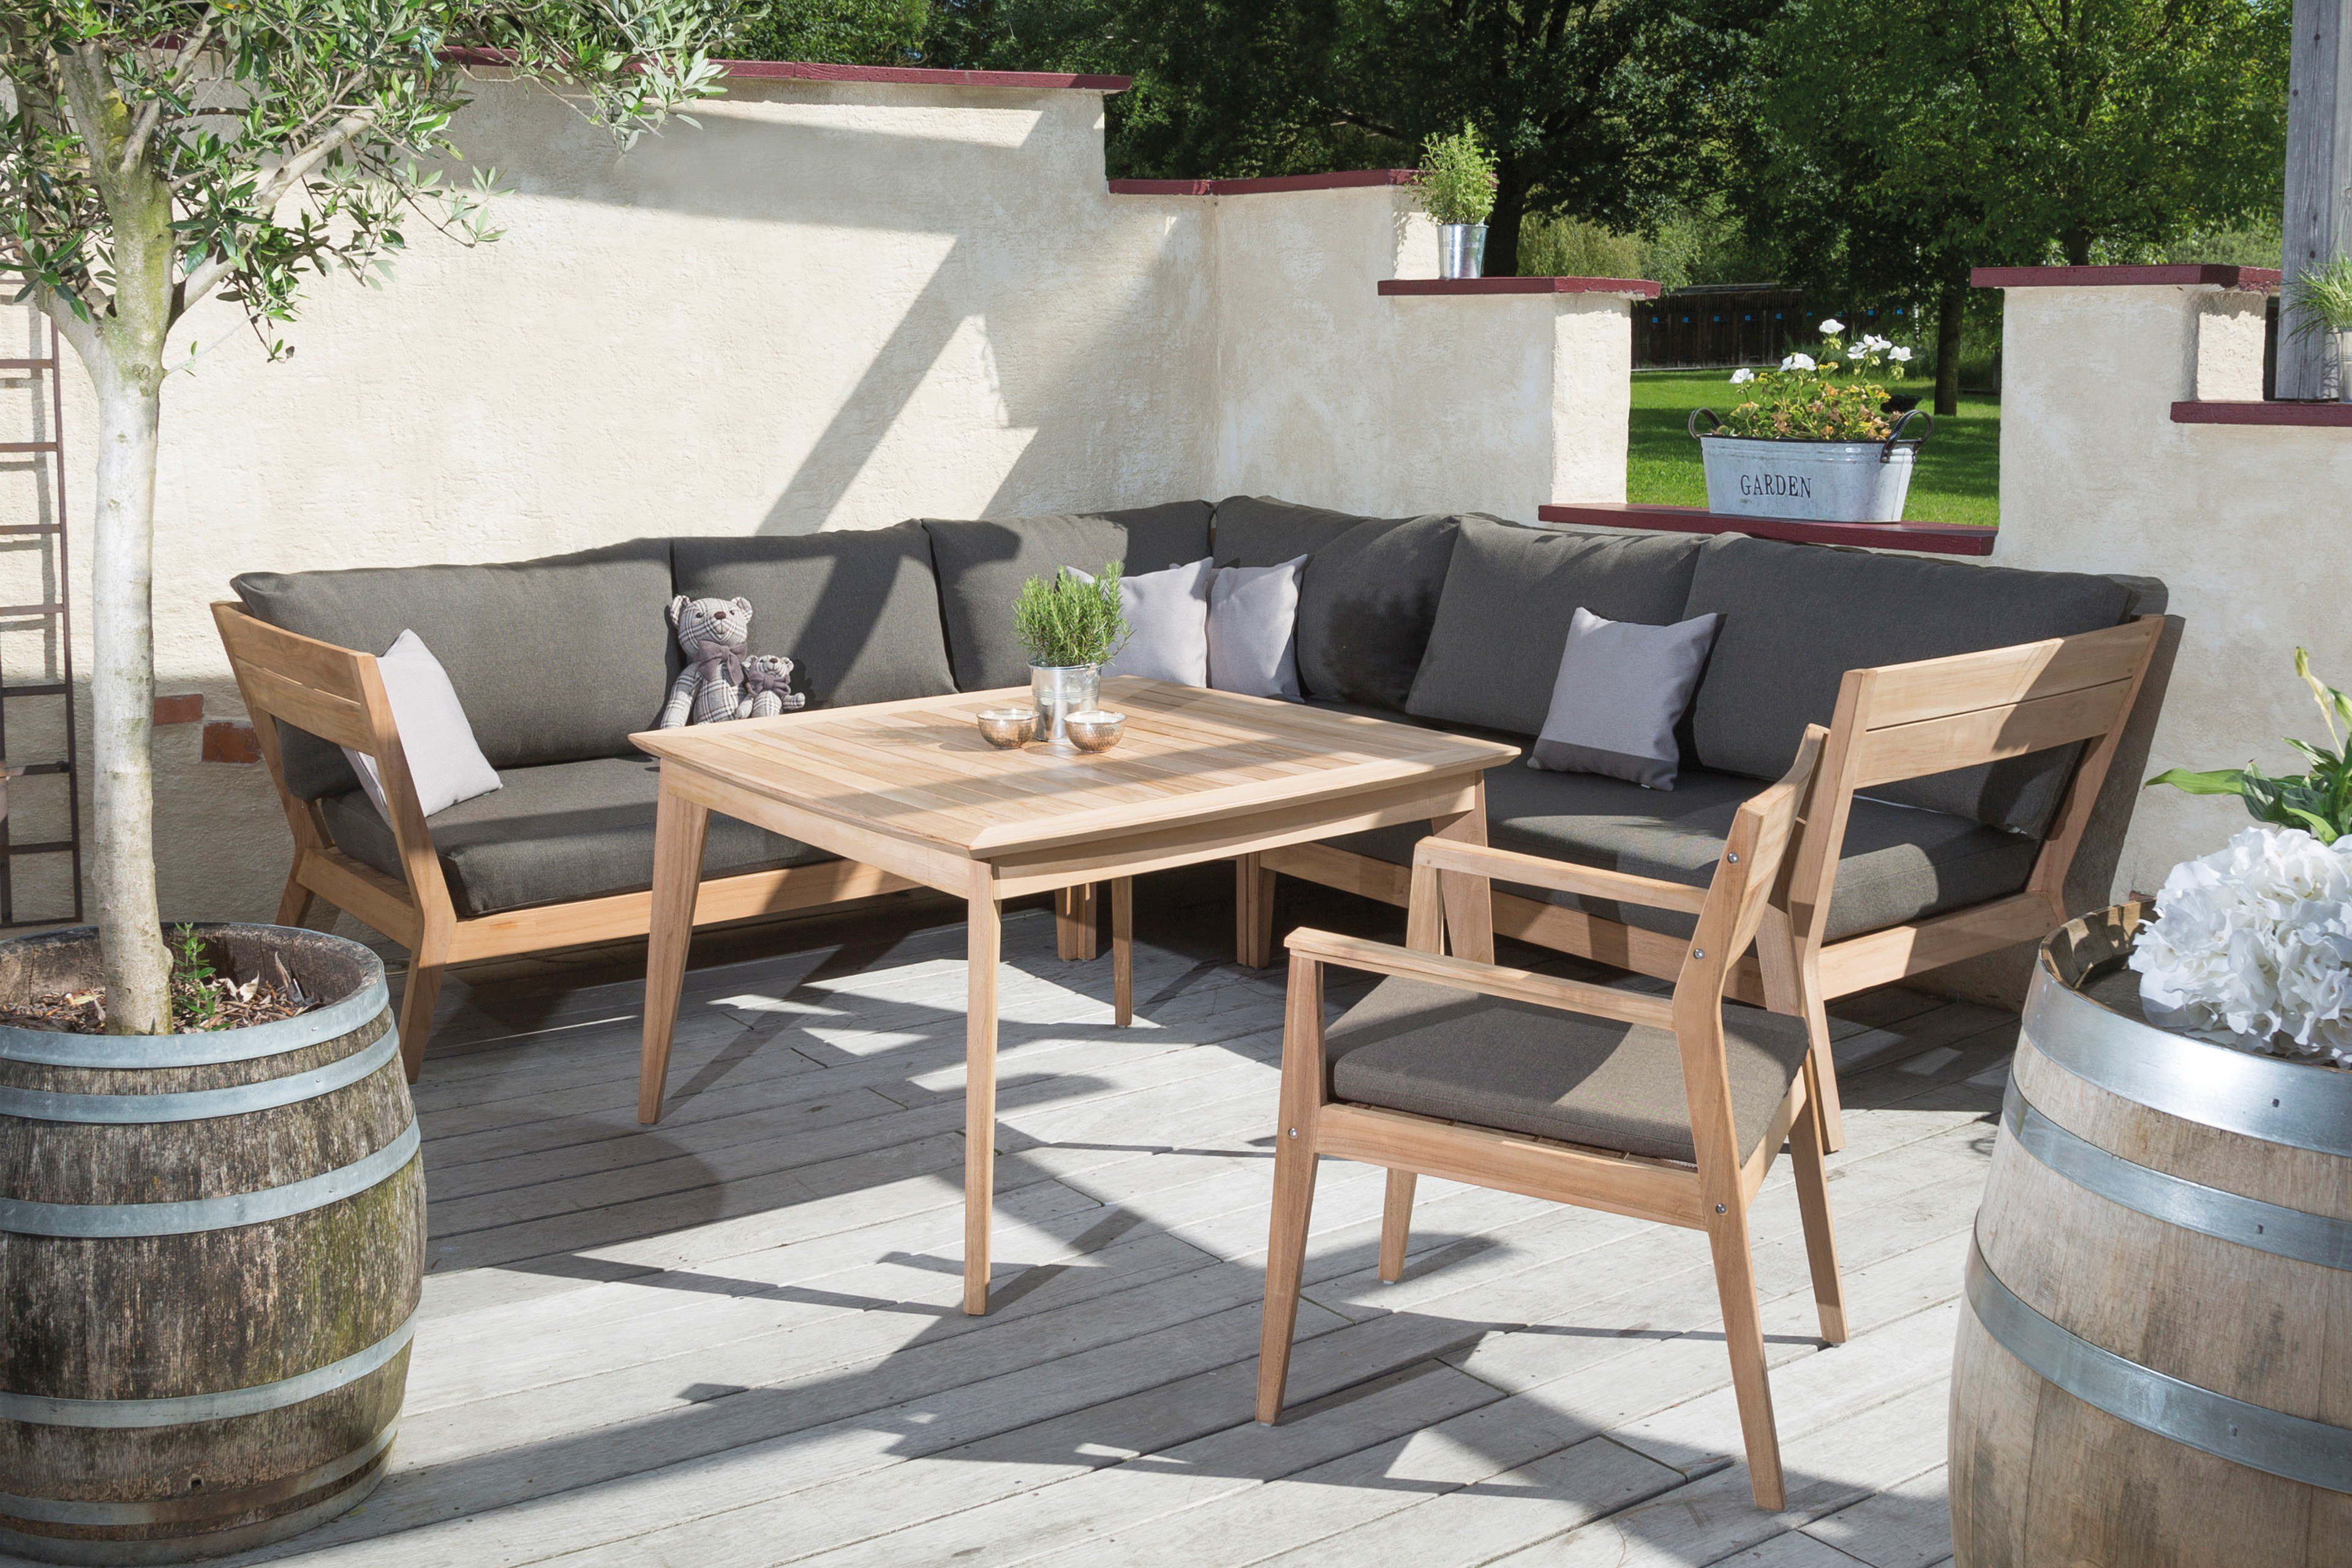 queen 39 s garden lounge set kent m bel letz ihr online shop. Black Bedroom Furniture Sets. Home Design Ideas